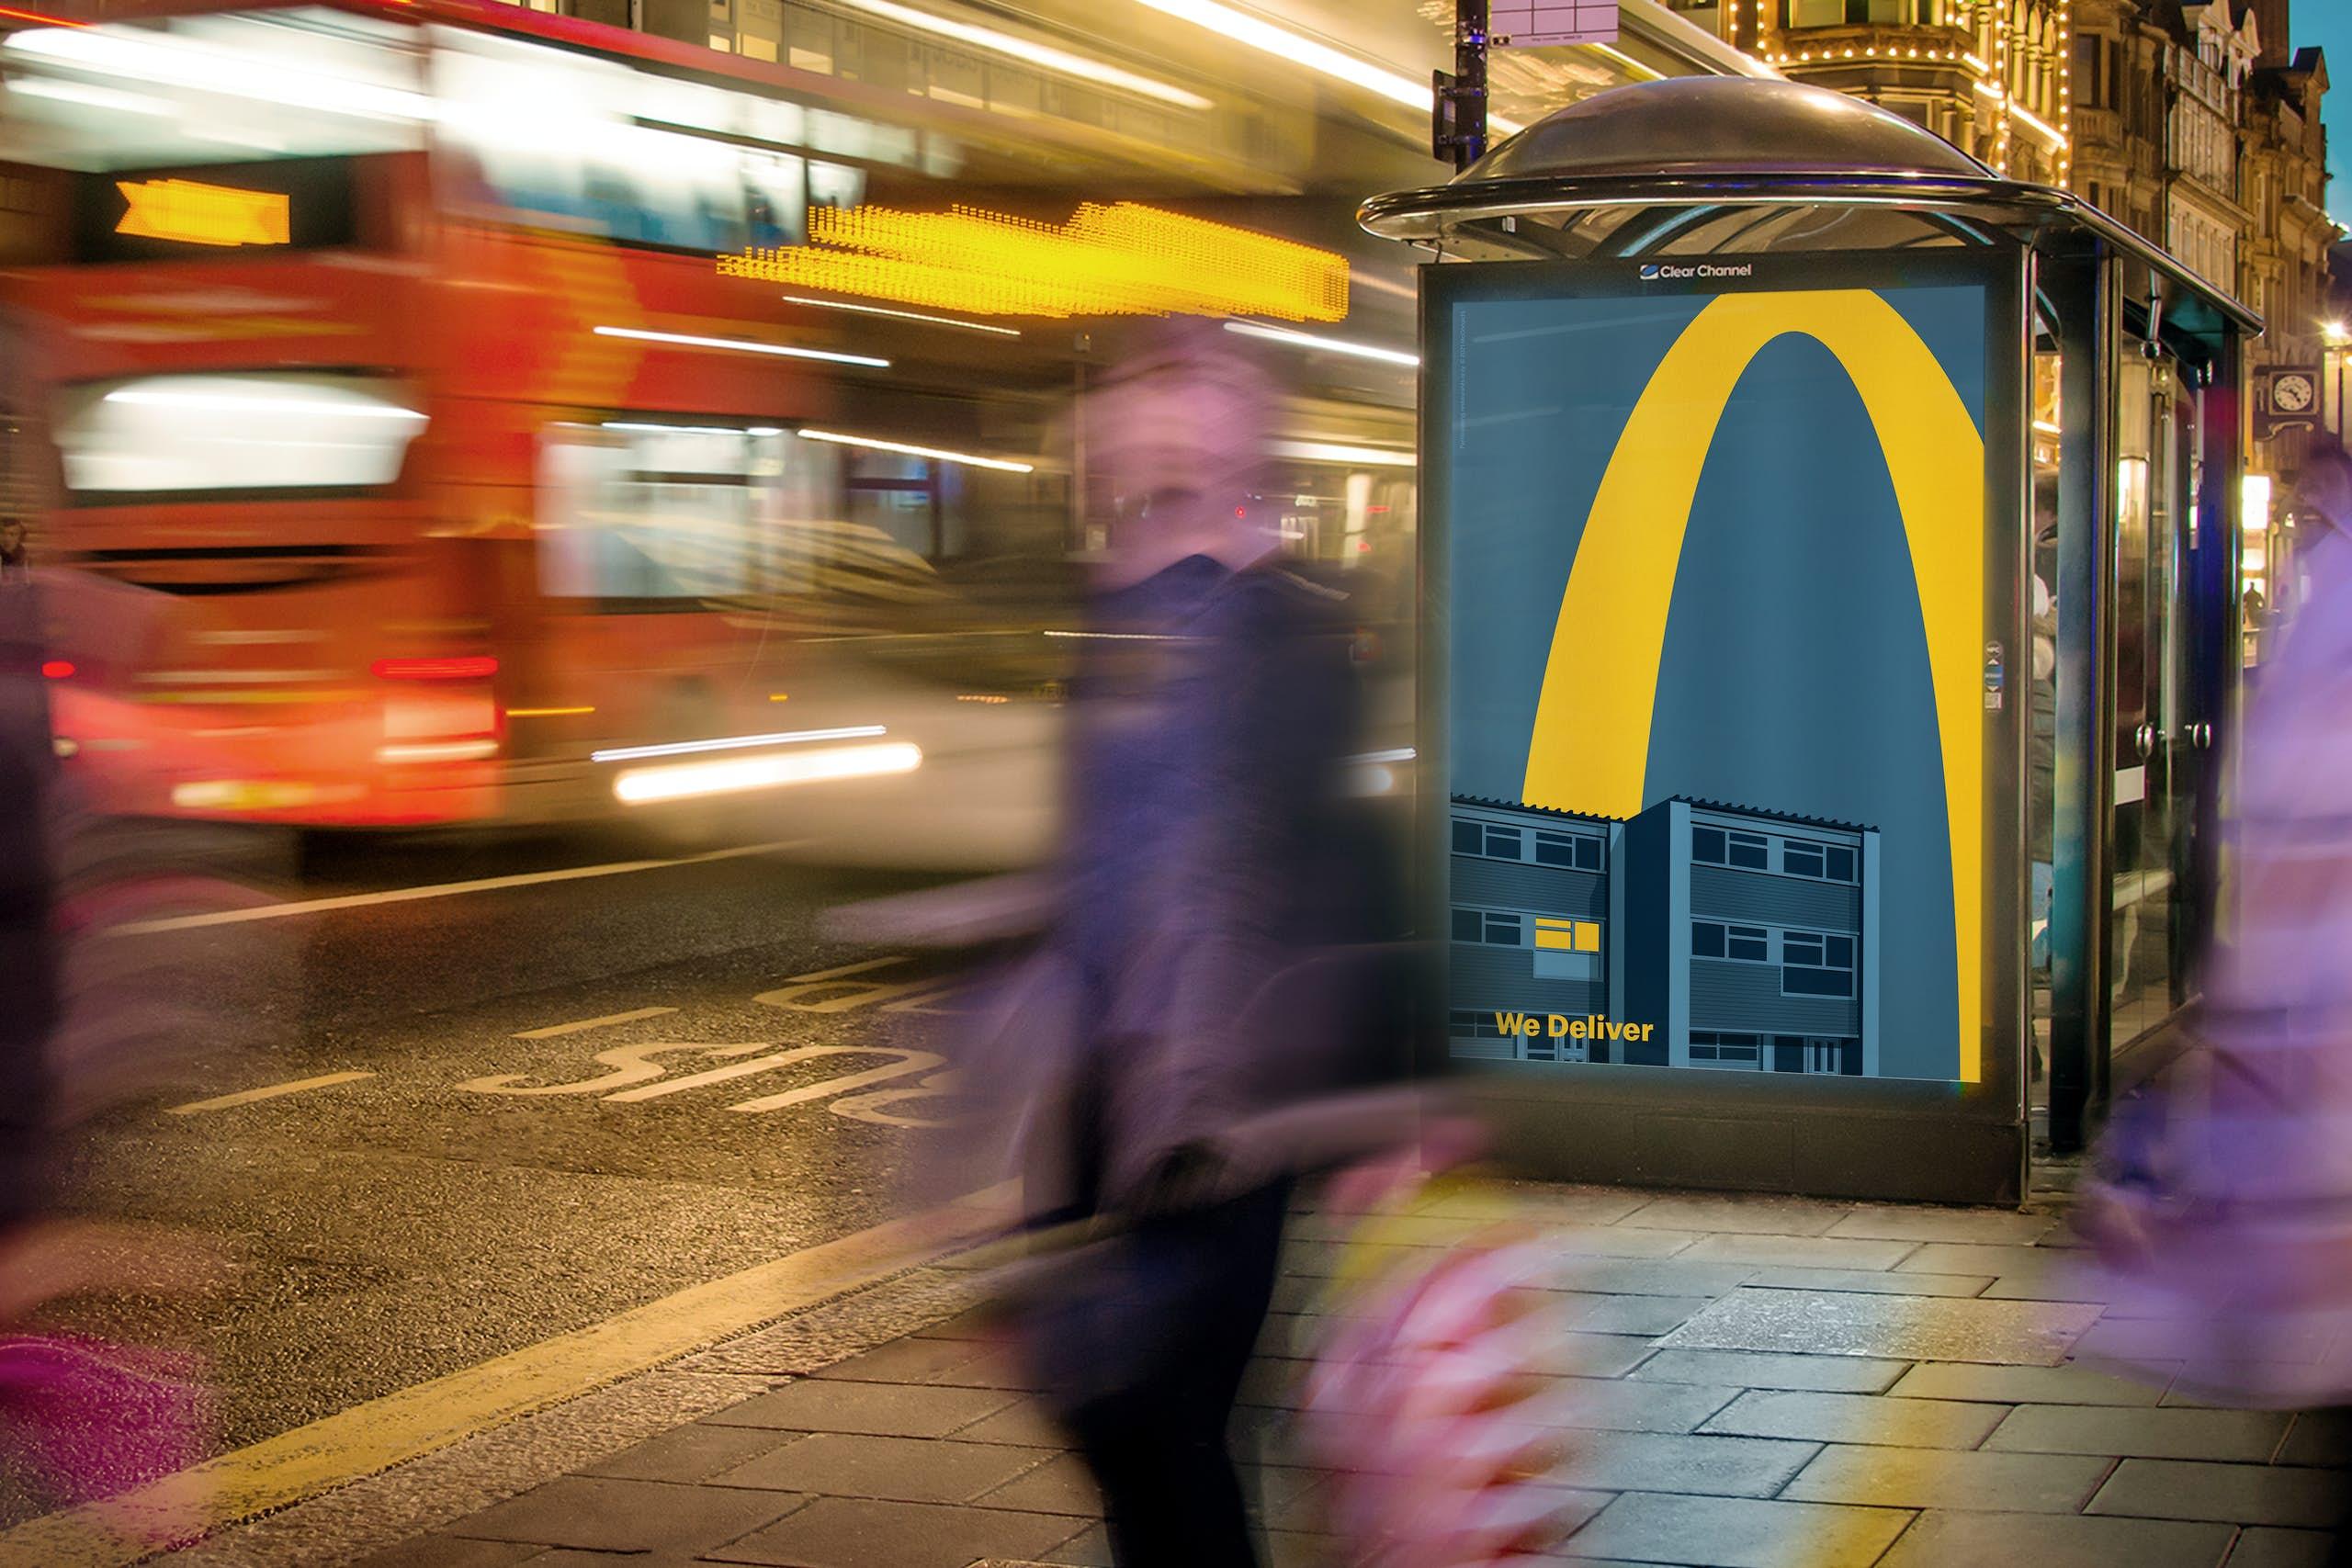 McDonalds Lights On 3